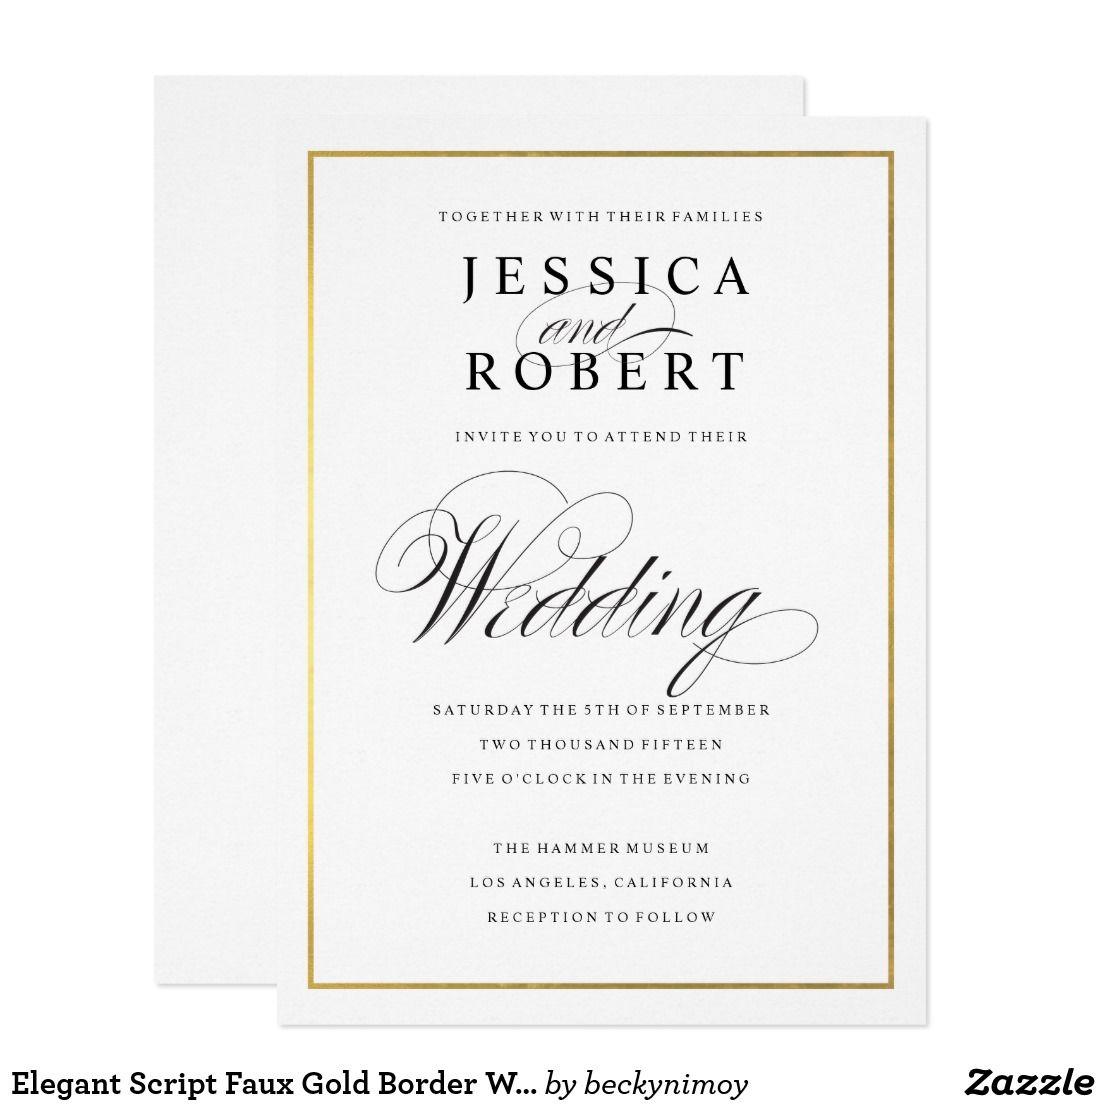 Elegant Script Faux Gold Border Wedding Invitation | Invitations ...